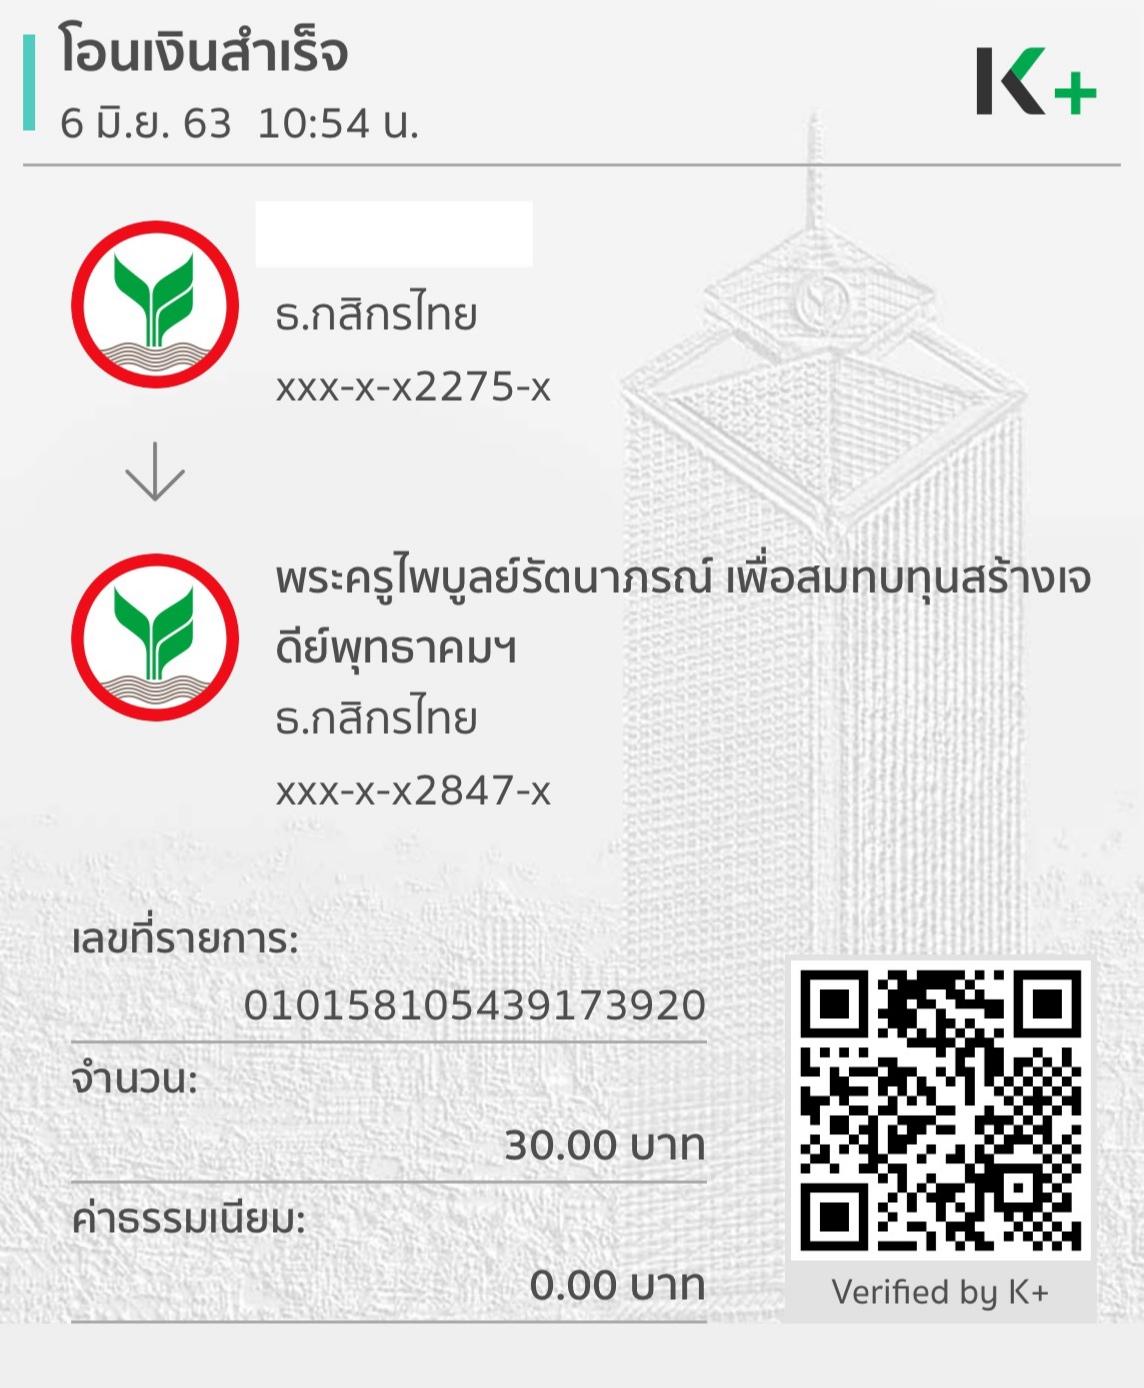 60275095-4203-4C9B-9D30-4F1FB6ECAB0C.jpeg